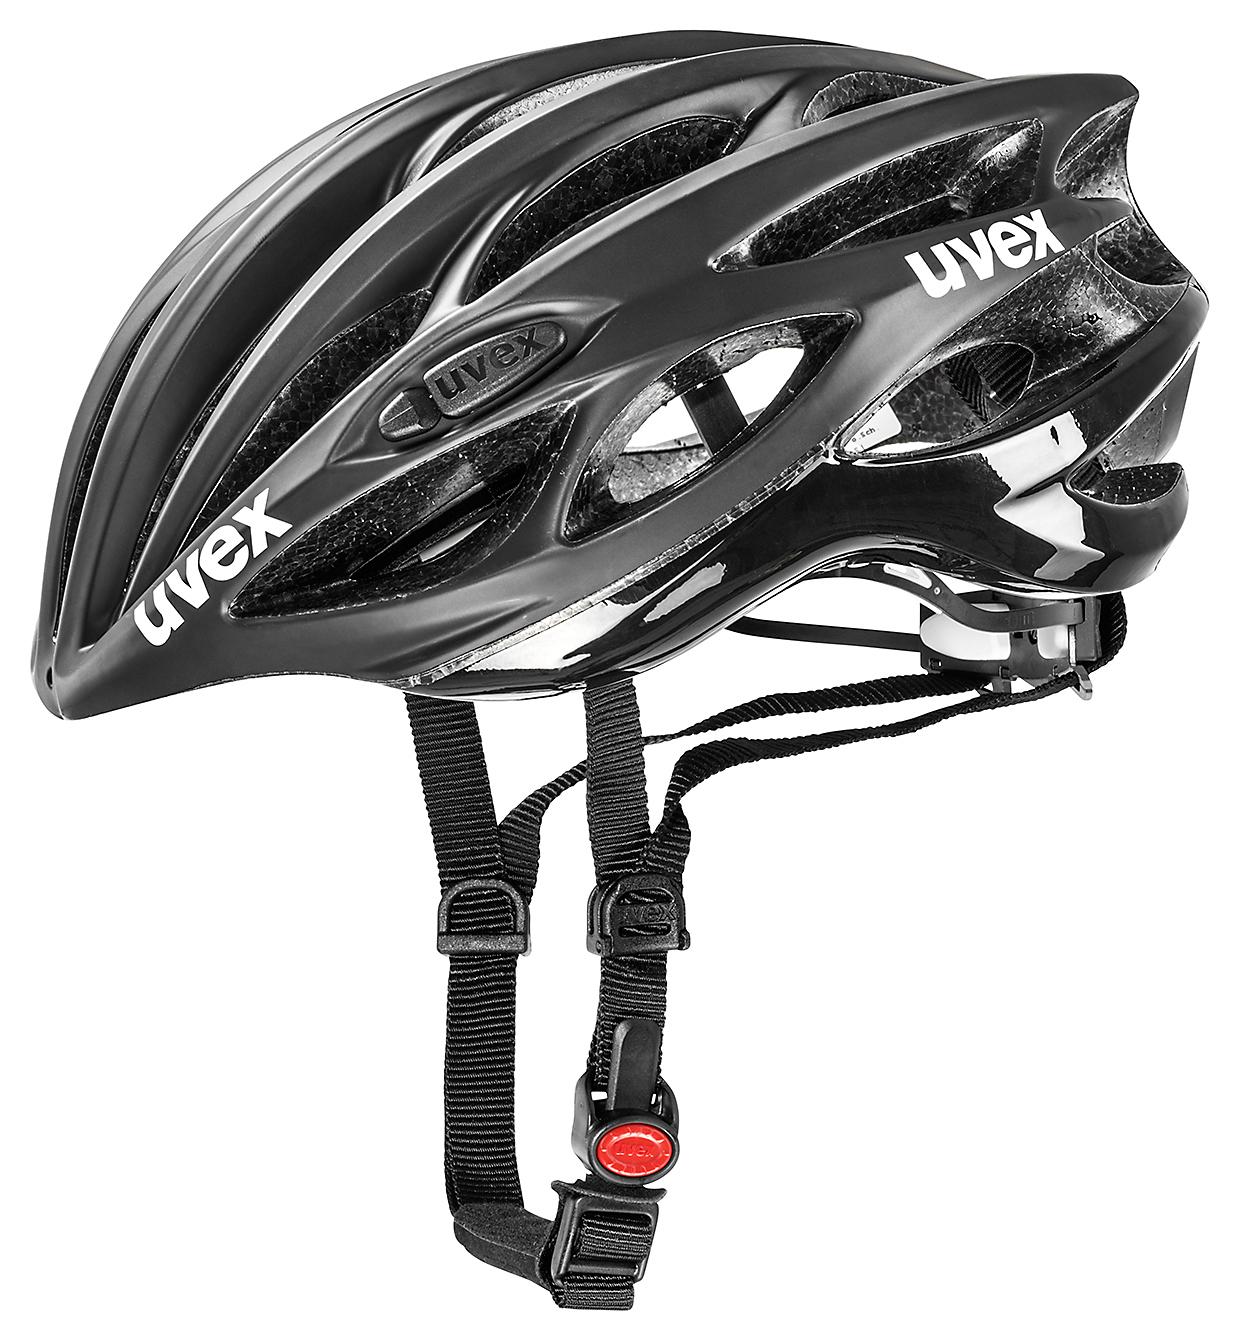 UVEX RACE 1, BLACK MAT-SHINY 2015 50-55 cm